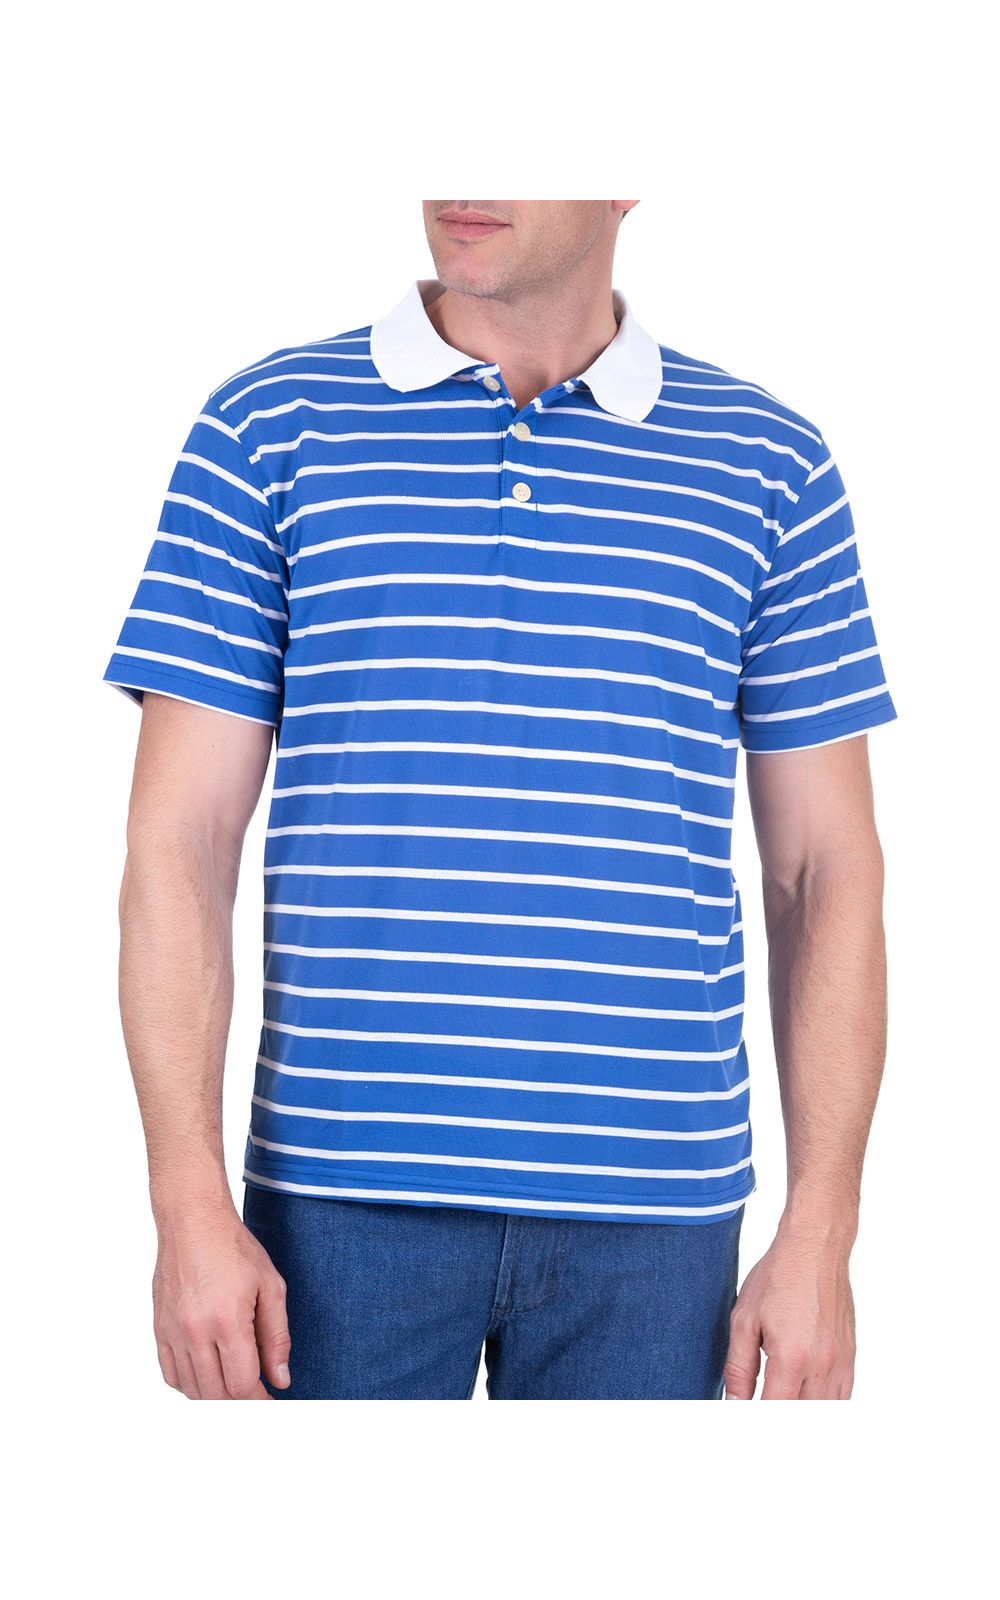 Foto 1 - Camisa Polo Masculina Azul Listrada